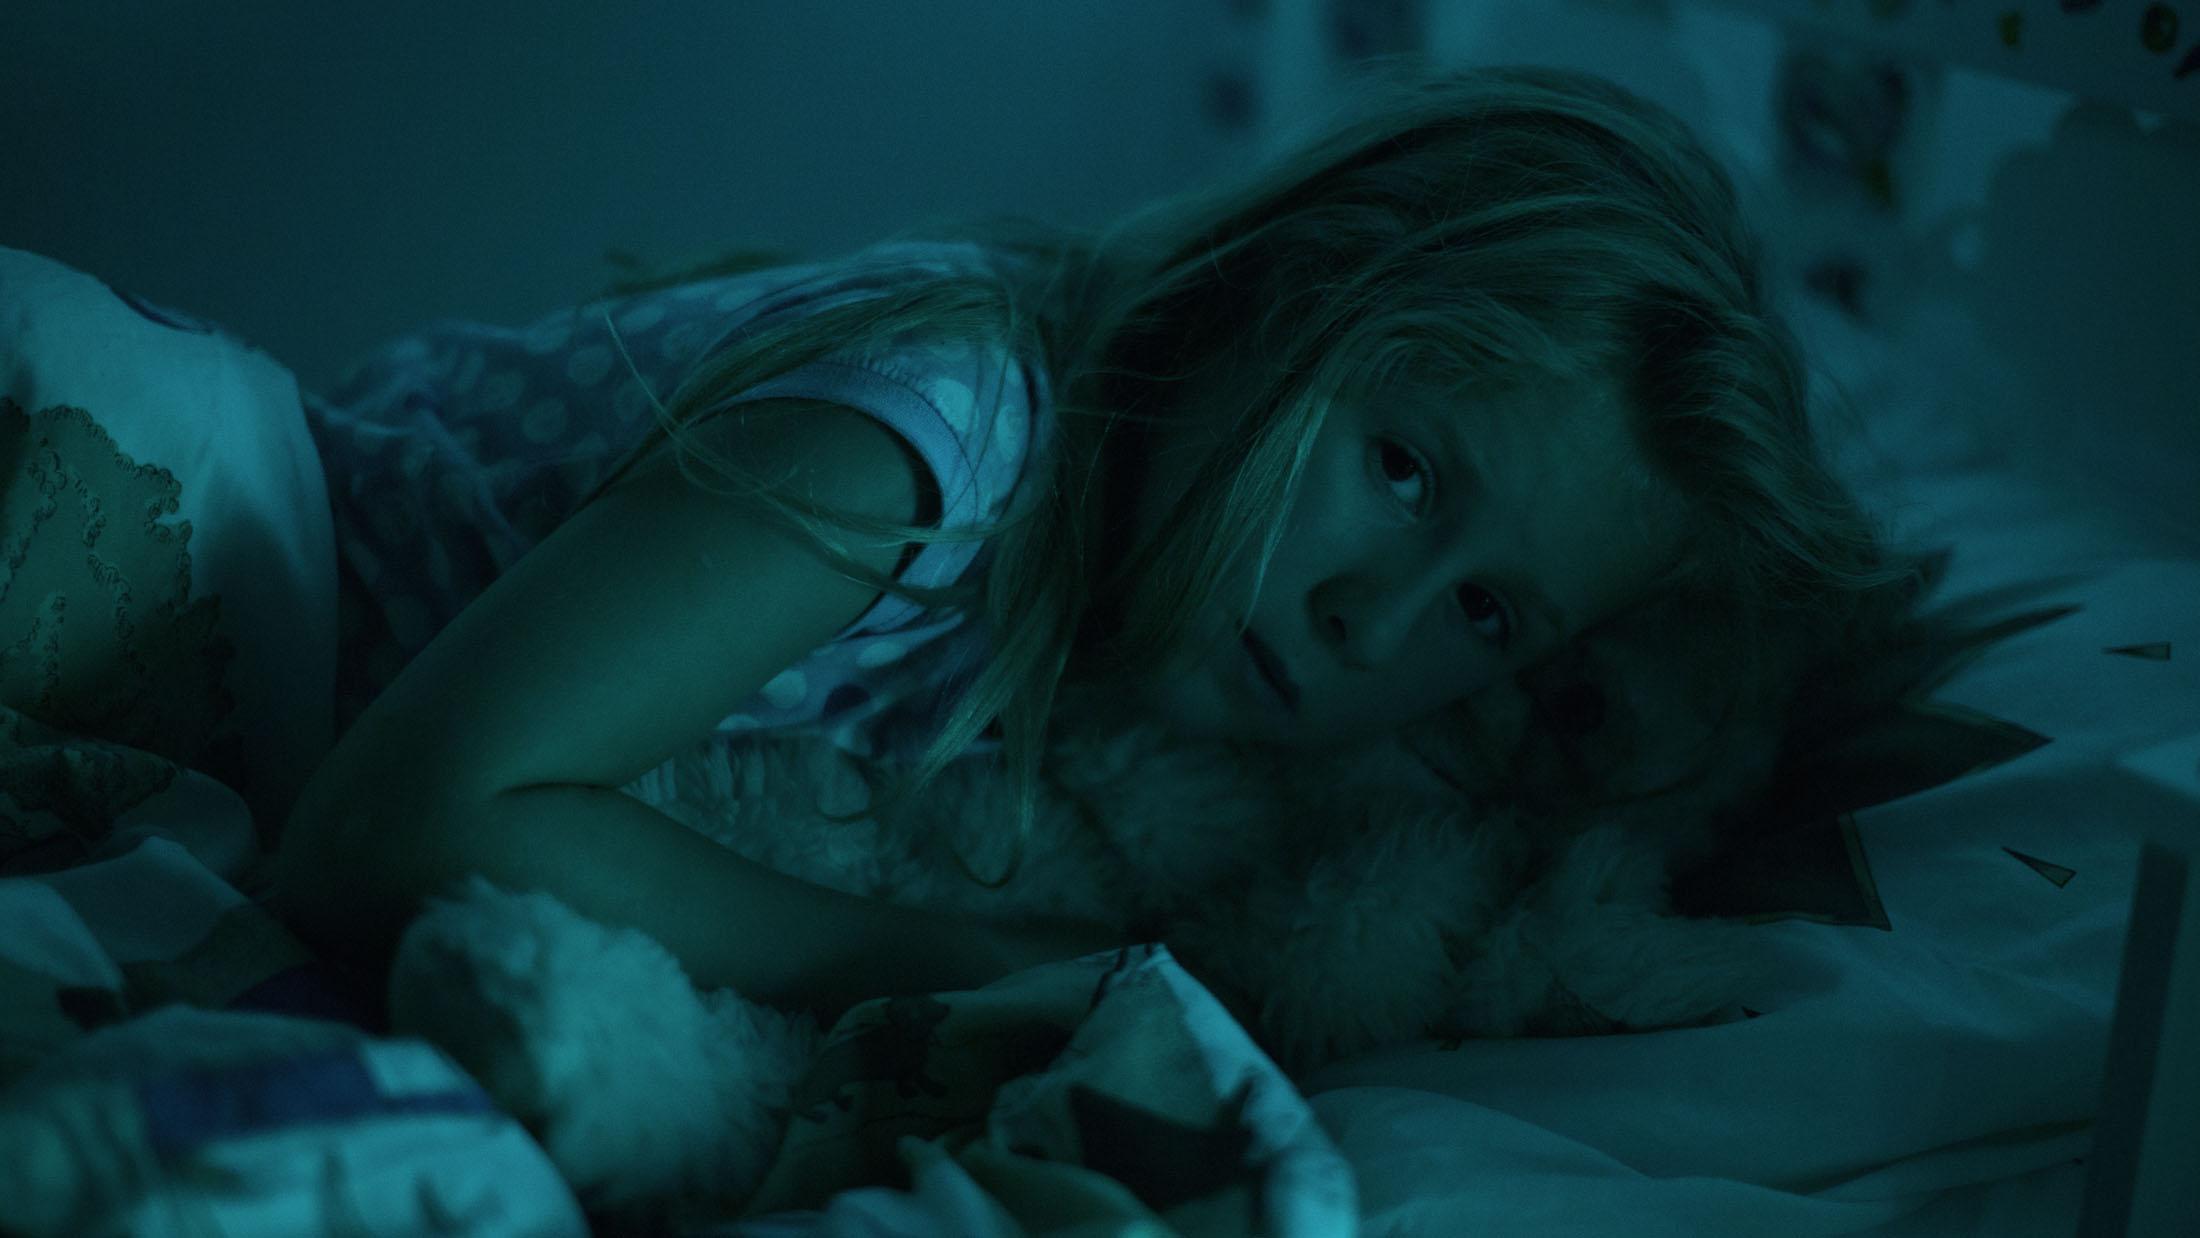 Esra Vandenbussche in LE CIEL FLAMAND directed by Peter Monsaert - DoP David Williams. Courtesy LUNANIME